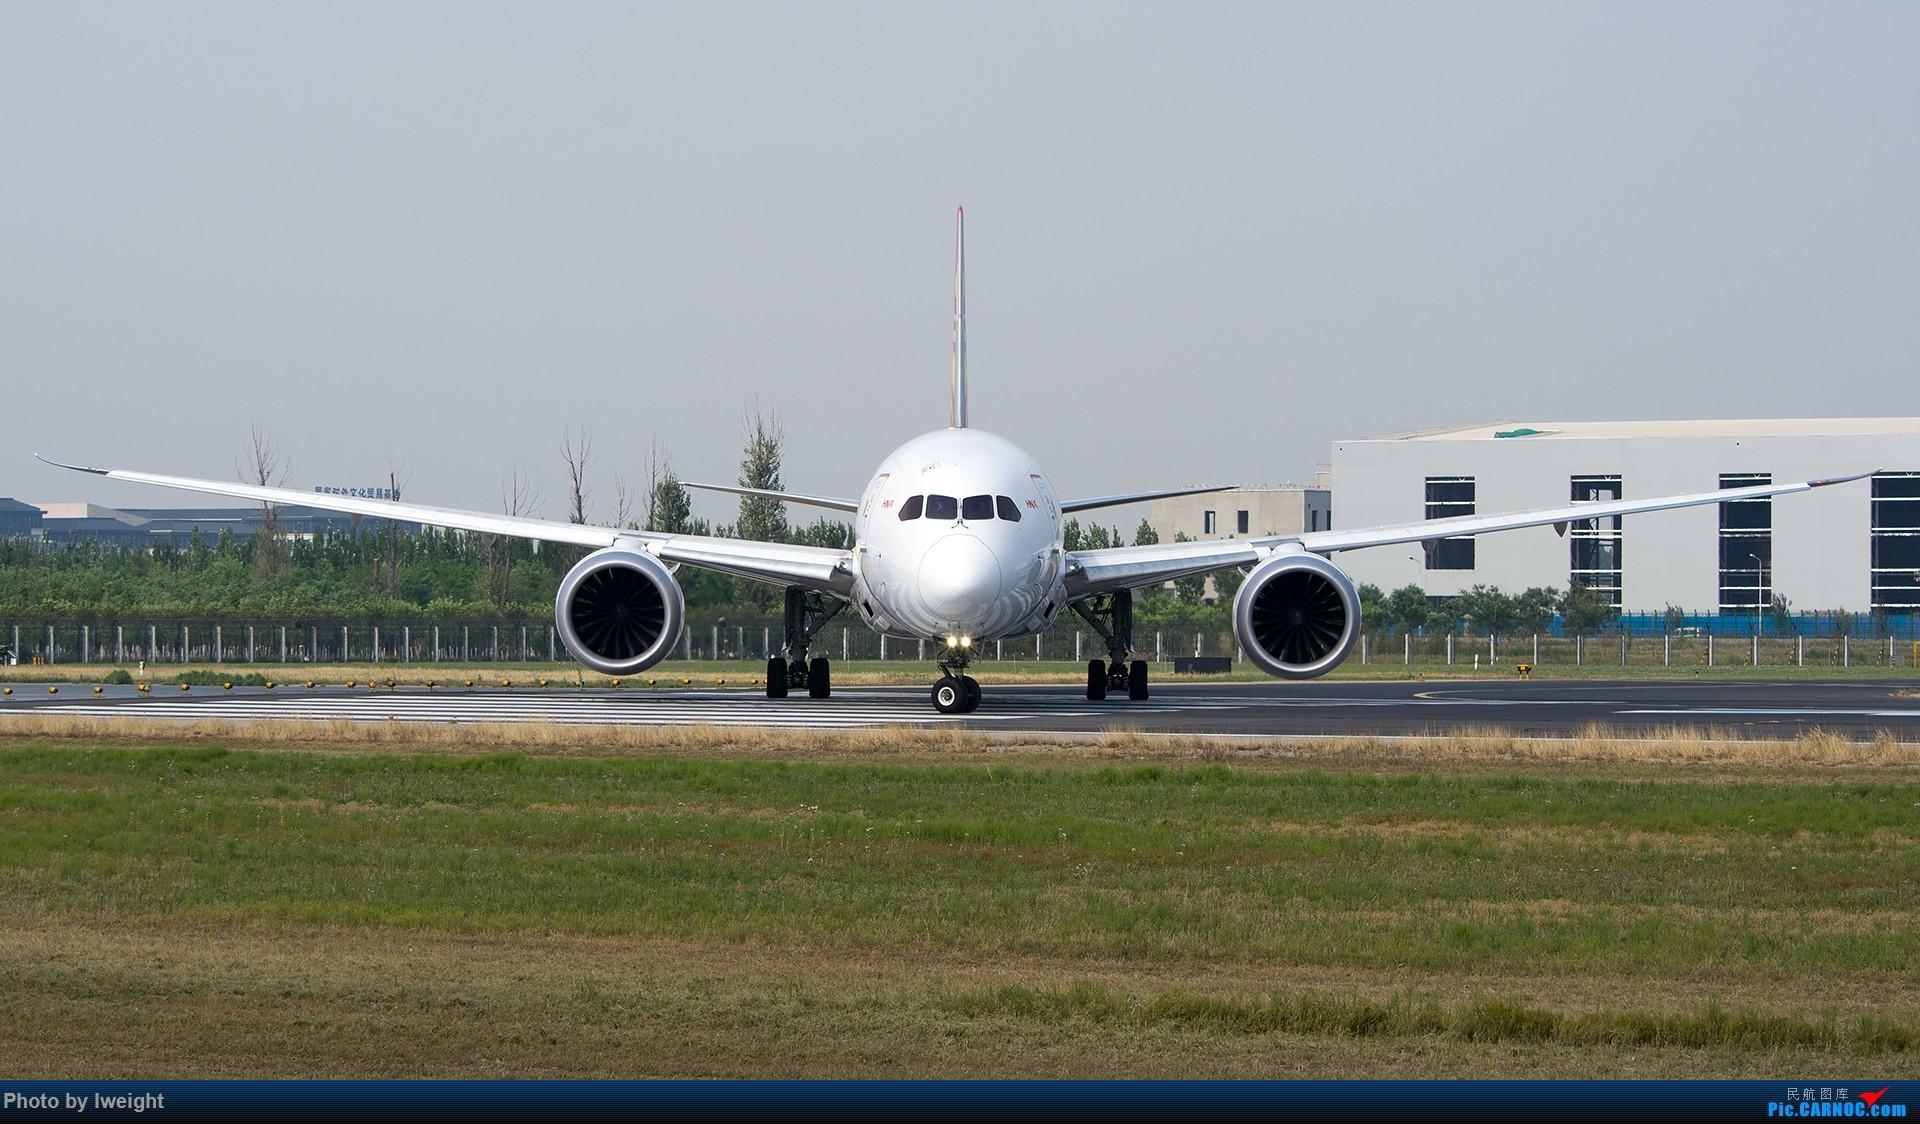 Re:[原创]周末帝都霾天拍机,凑合看看吧【2015-5-23】 BOEING 787-8 B-2739 中国北京首都国际机场